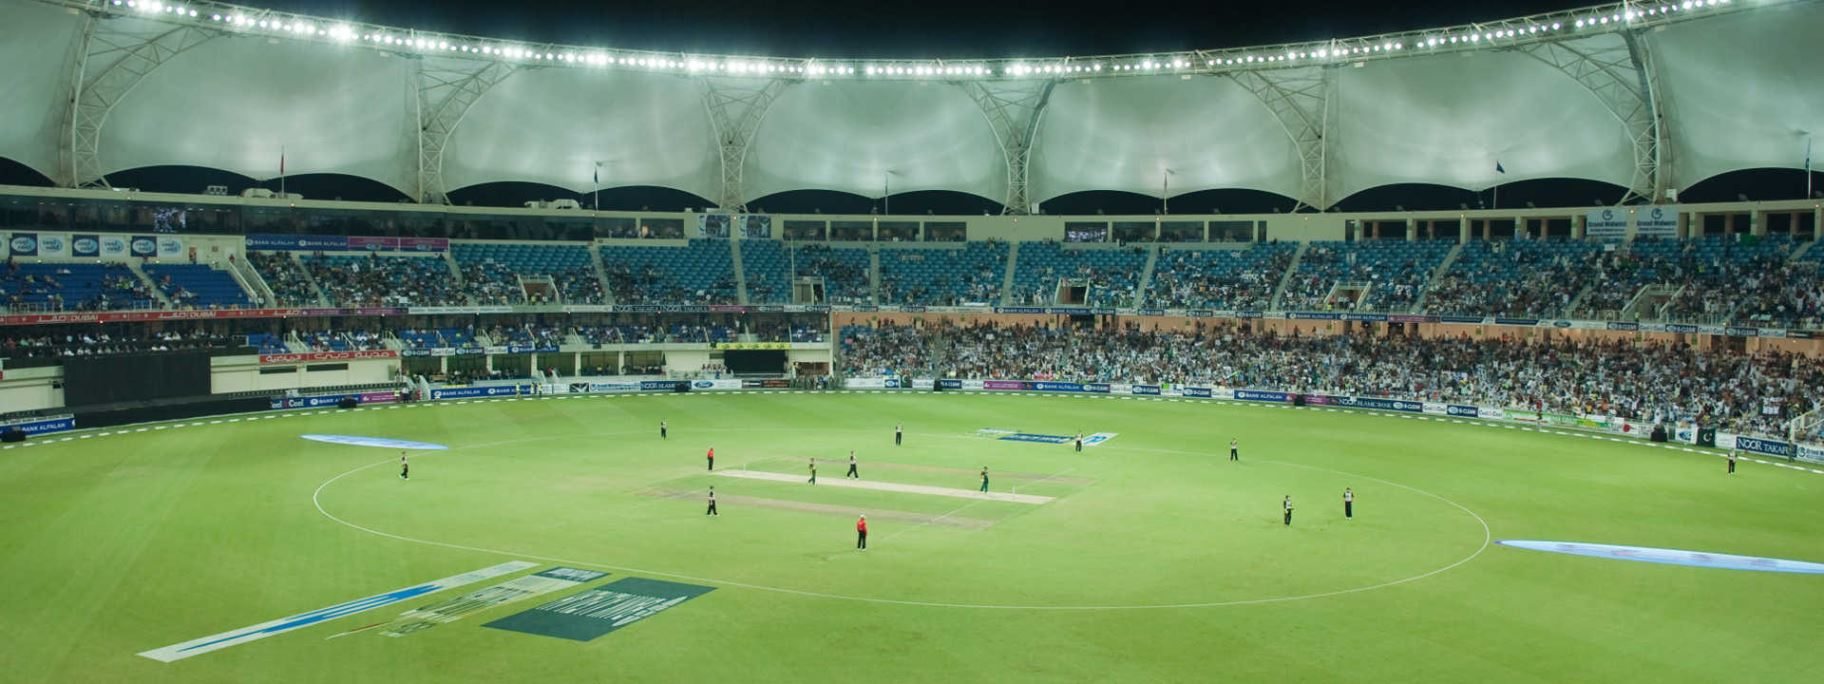 Dubai Sports City Football Dubai Sports City Overseas